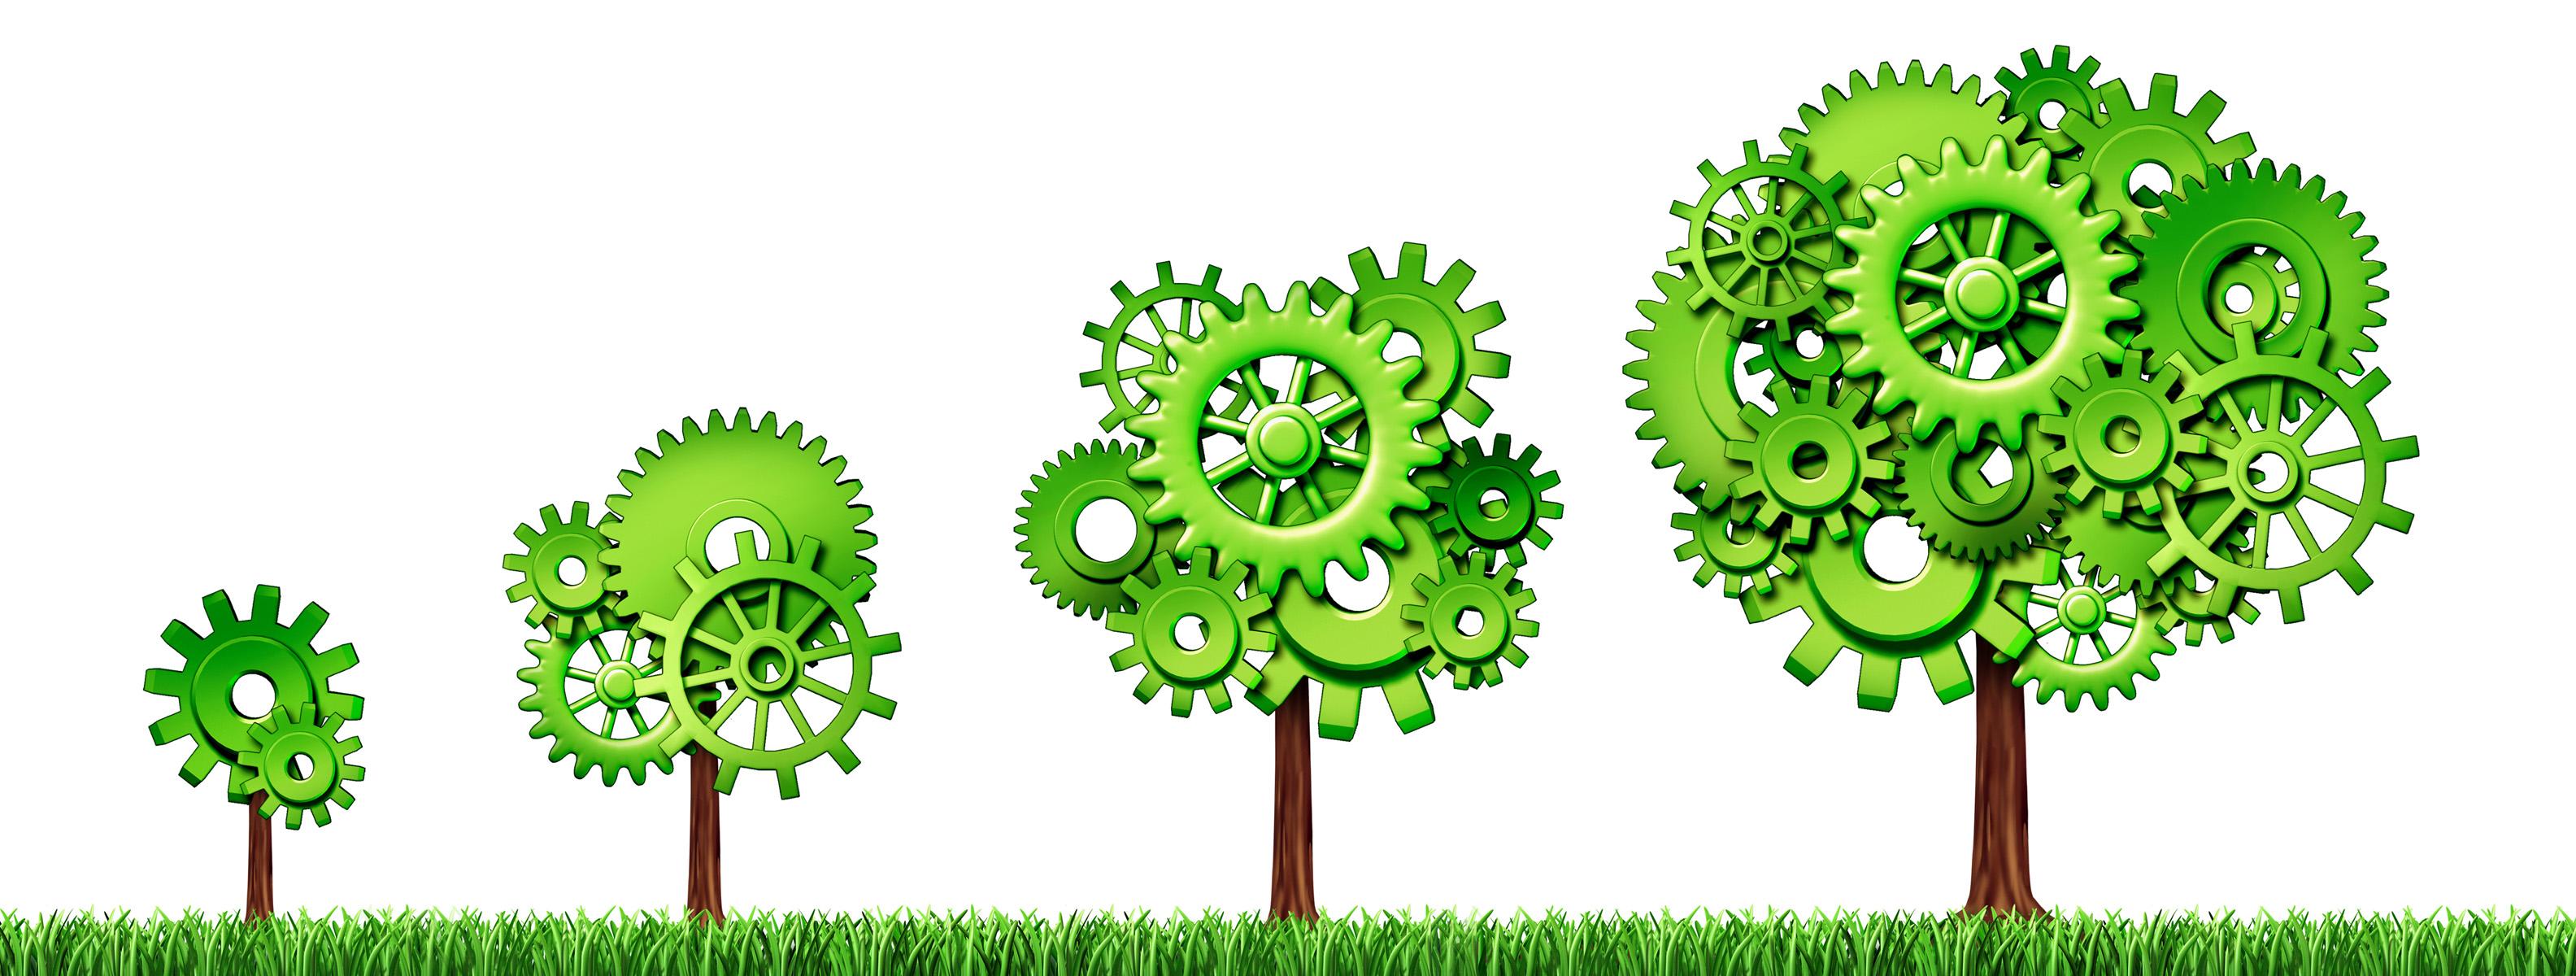 GREEN-GROWTH.jpg